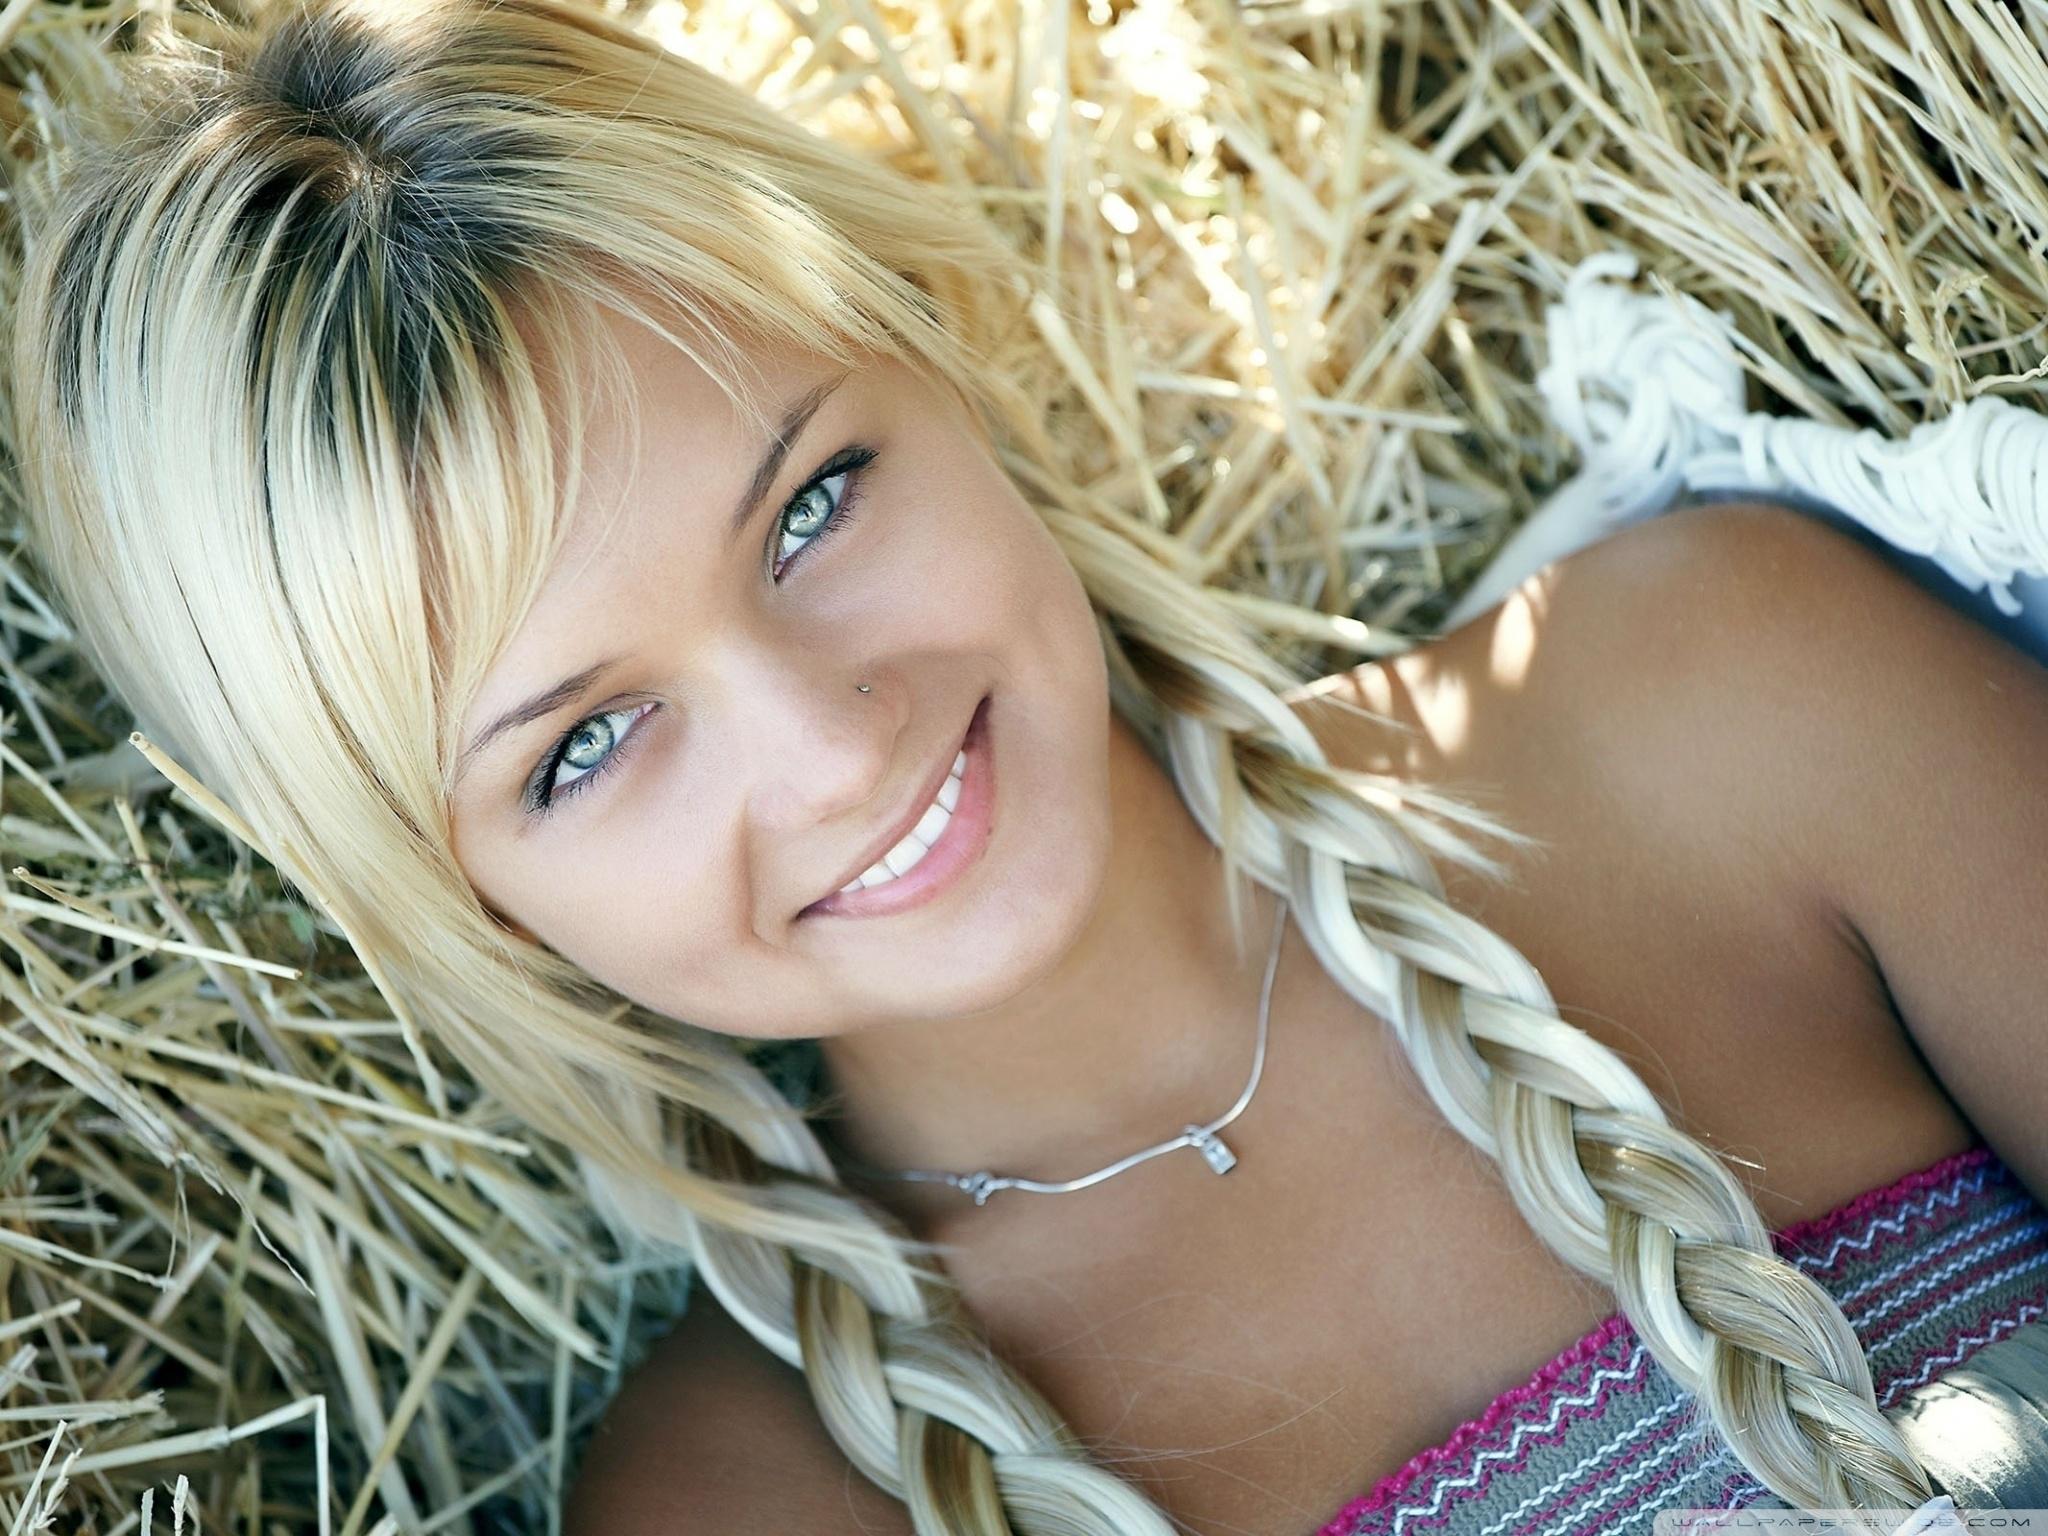 Nude blonde milf pics